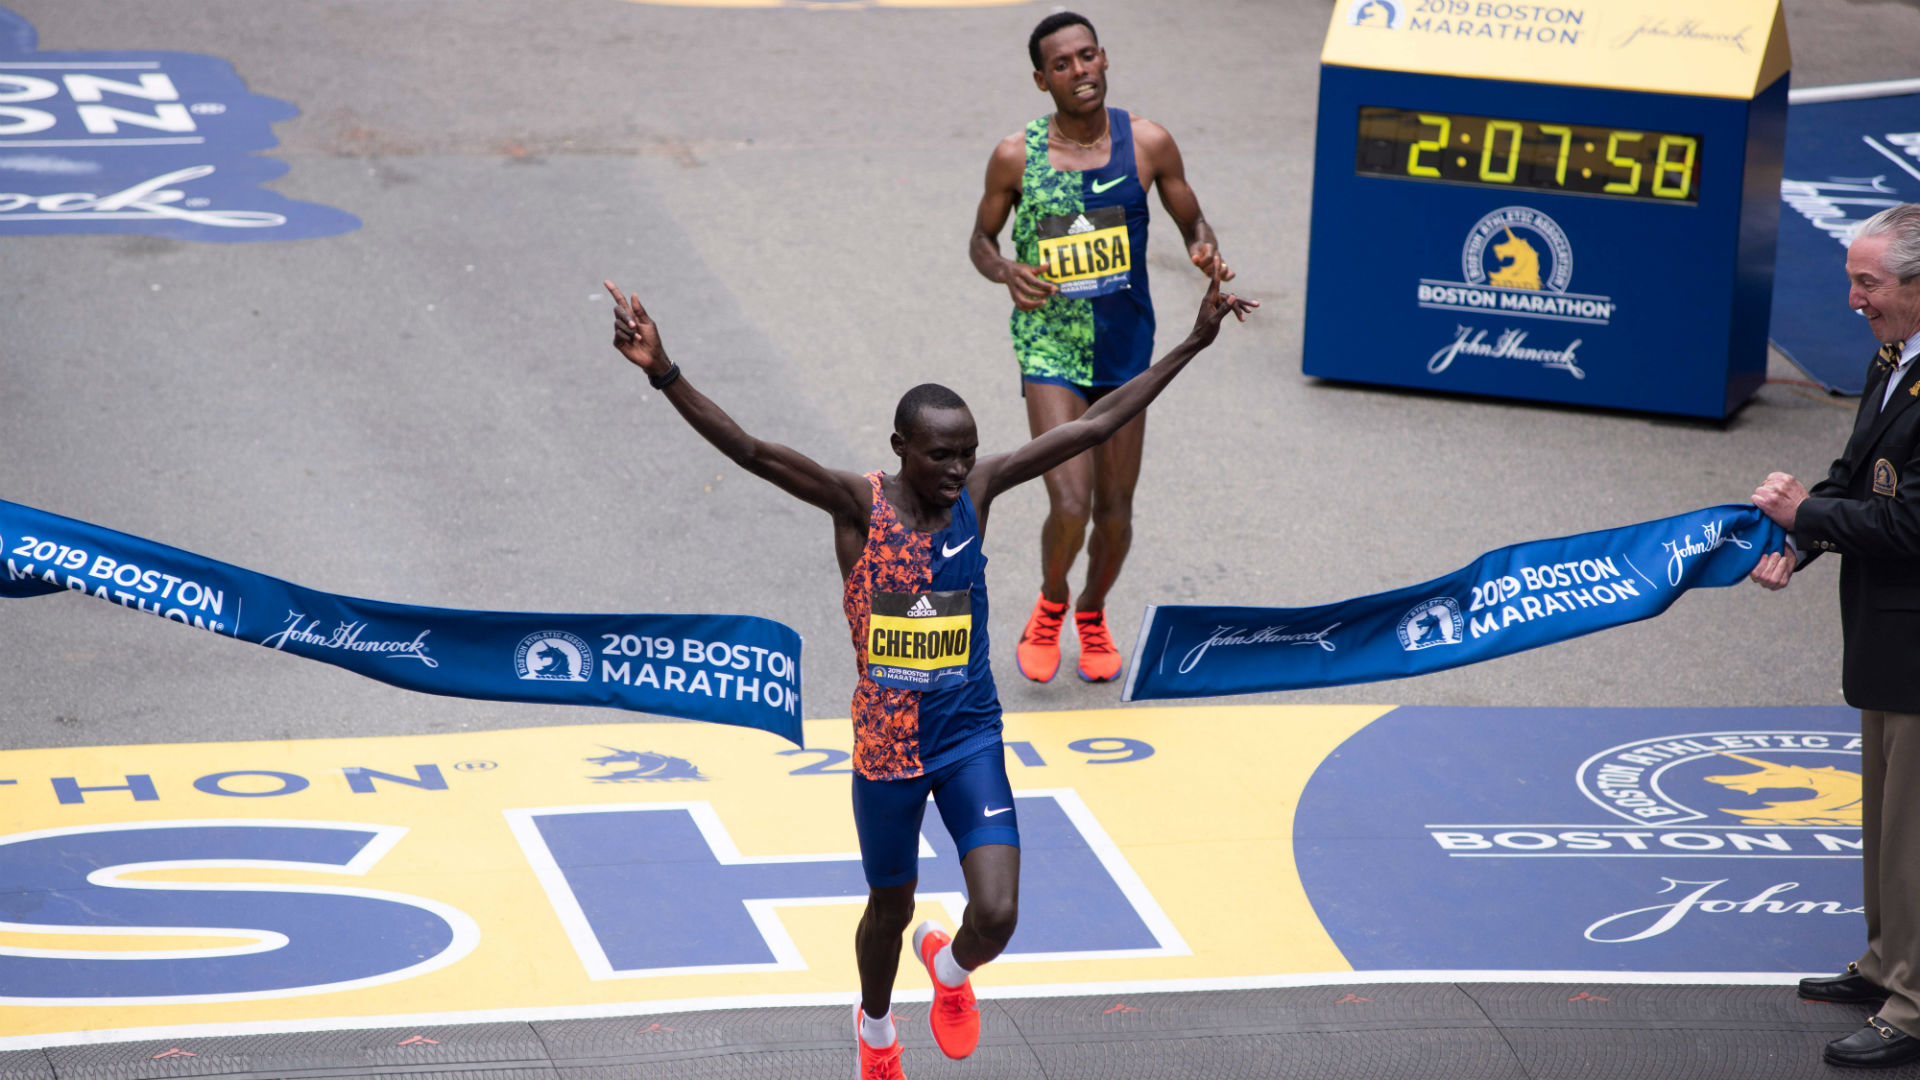 Boston Marathon Results Complete List Of 2019 Winners